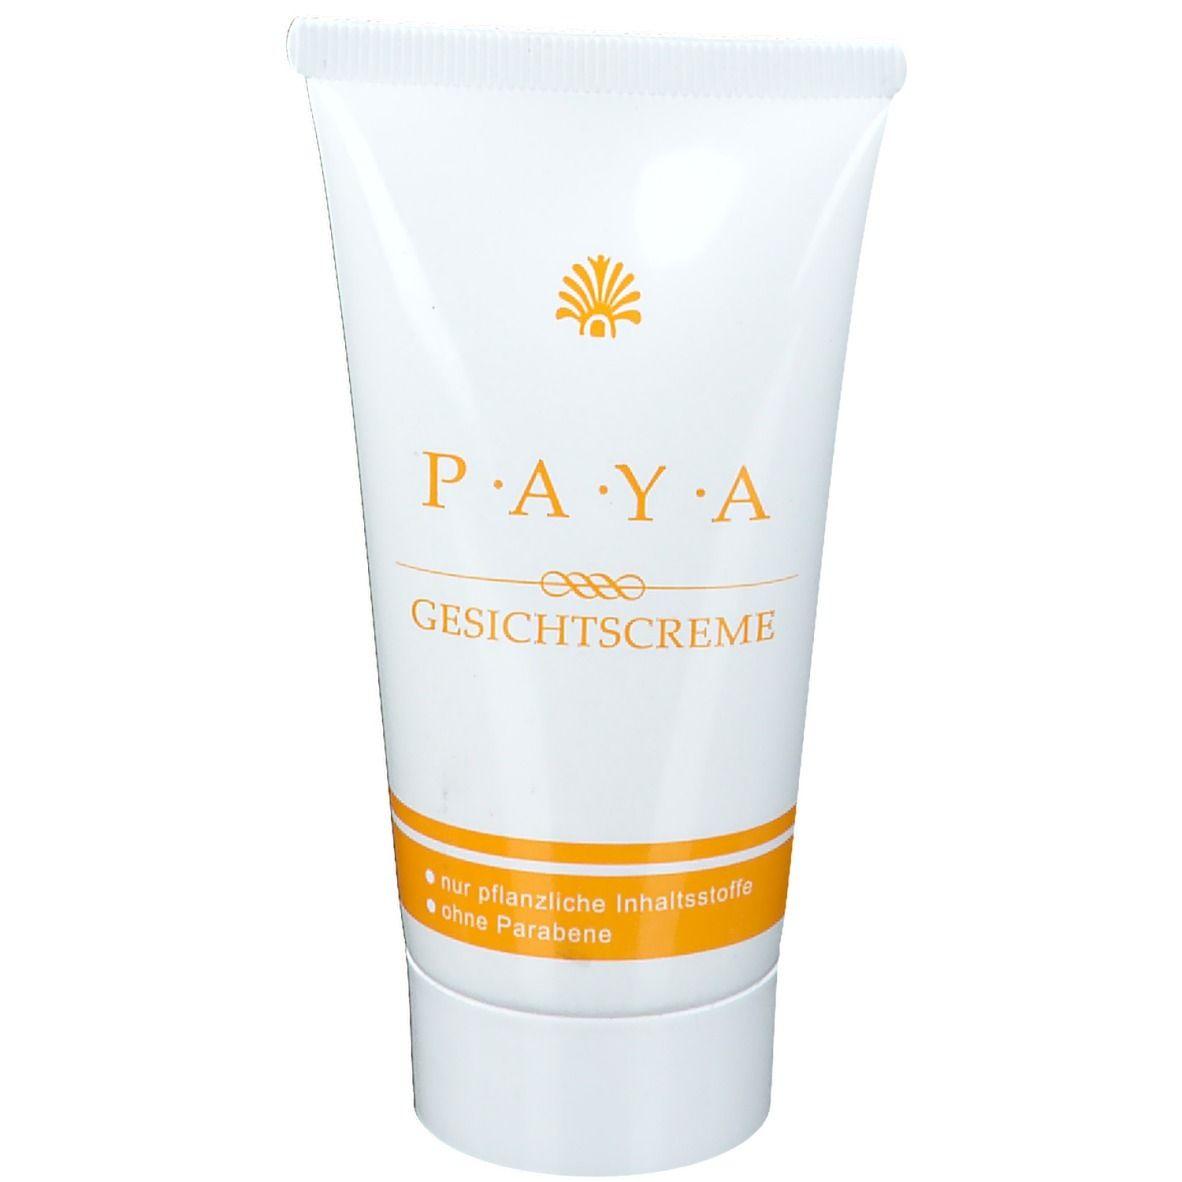 PAYA-Gesichtscreme